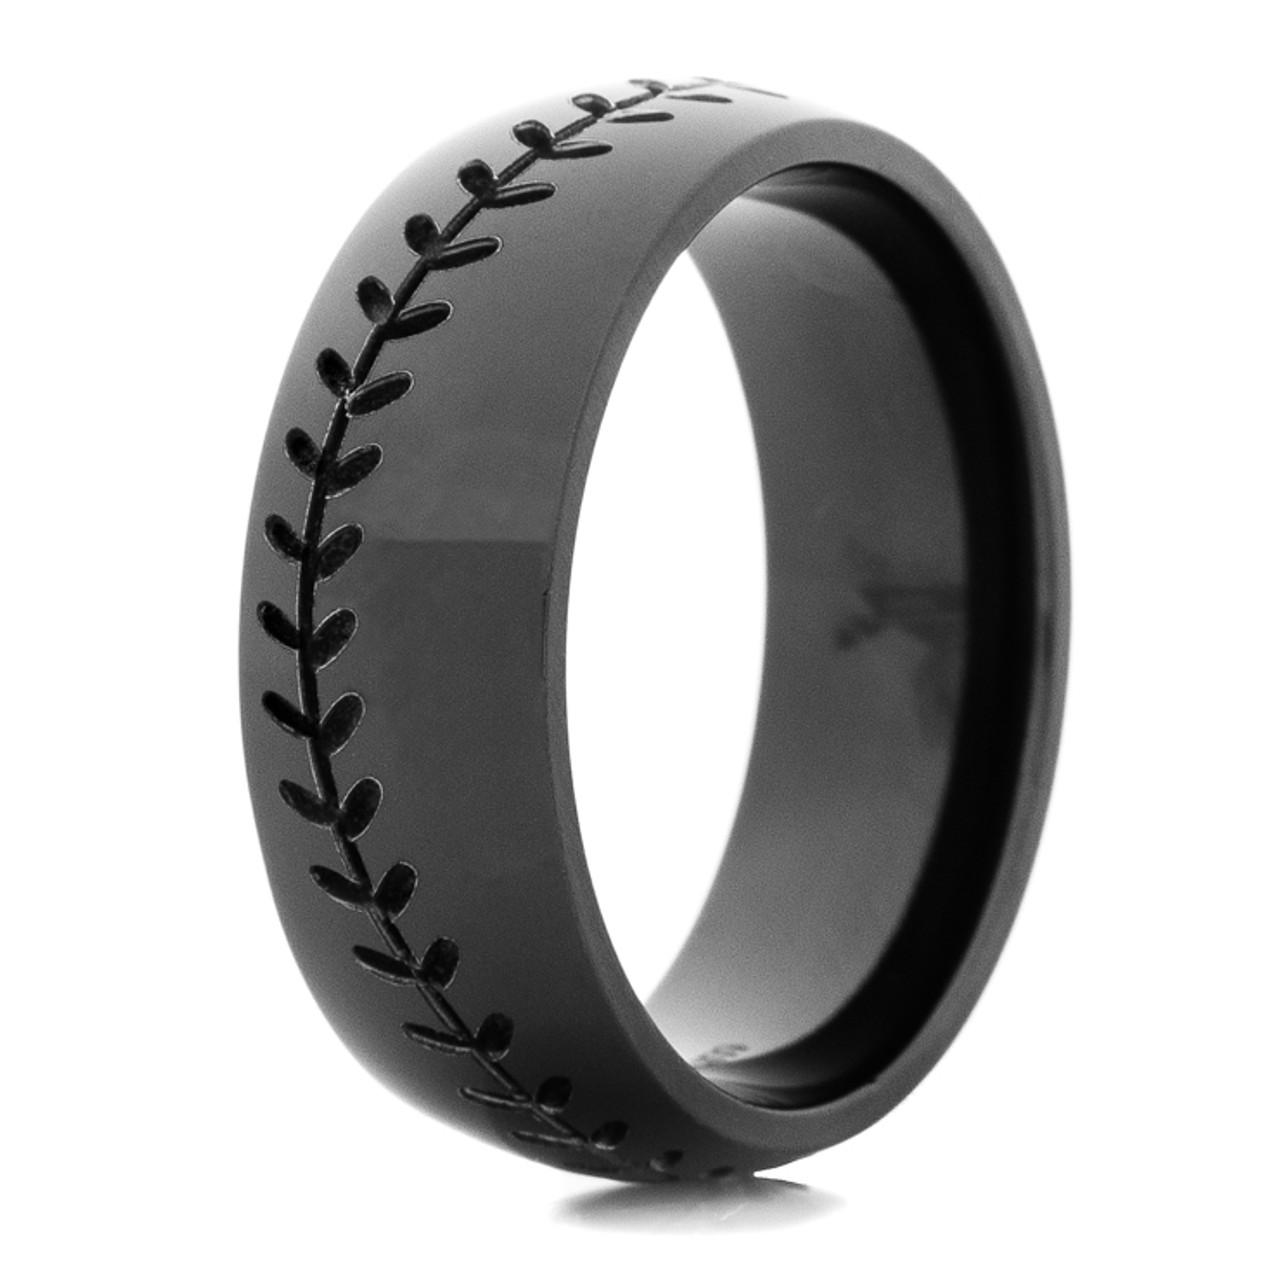 Men's Black Baseball Ring  Titanium Buzz. Gypsy Rings. Samnsue Wedding Rings. Four Band Engagement Rings. Veneer Rings. Portrait Rings. 6mm Wedding Rings. Smu Rings. Beautiful Blue Wedding Engagement Rings